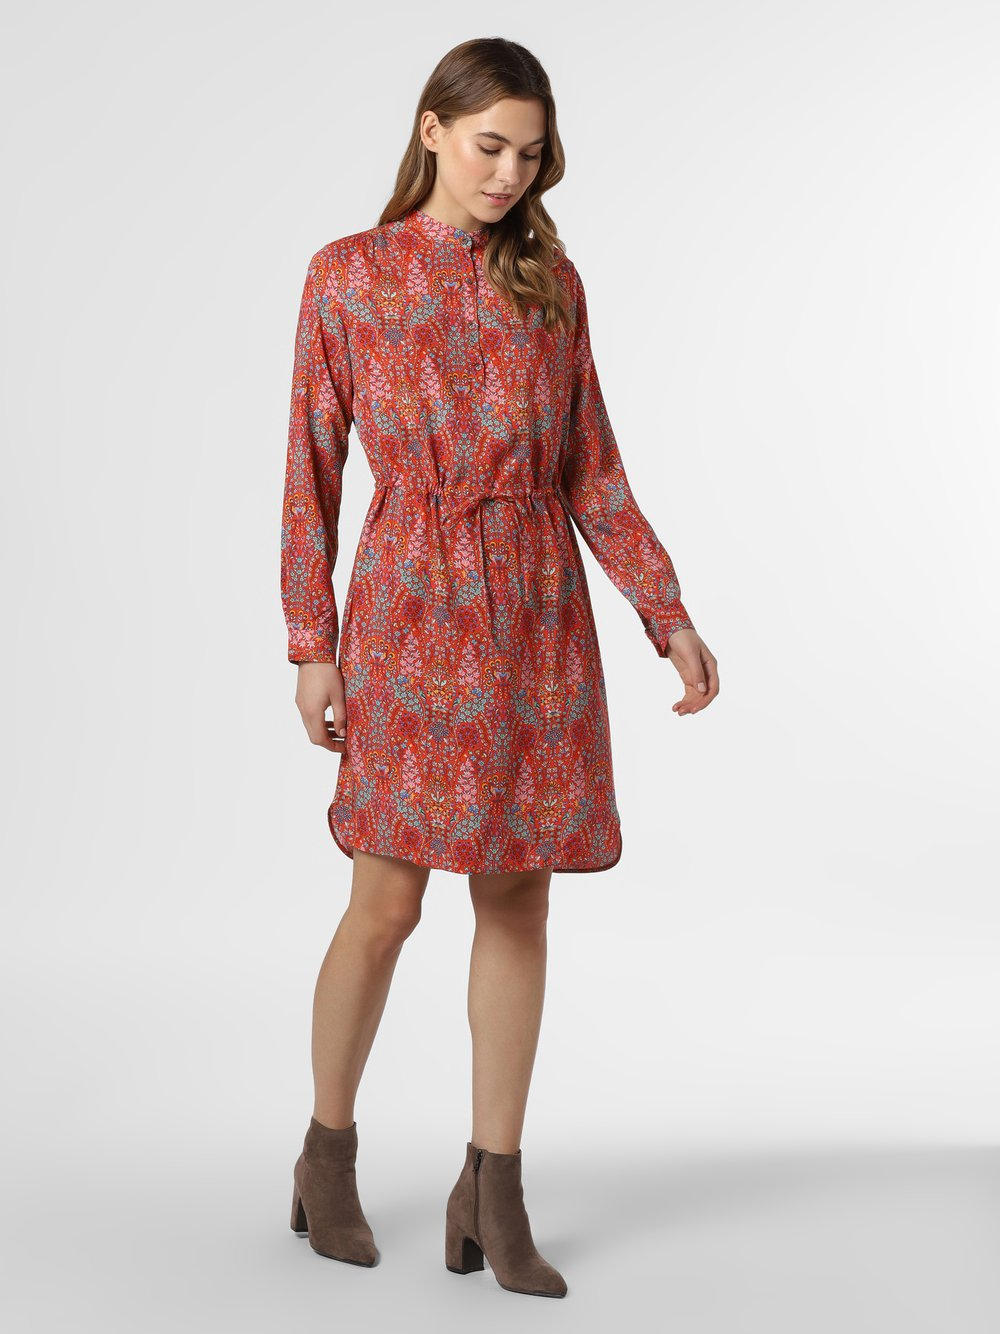 0039 Italy – Sukienka damska – Moss New, pomarańczowy Van Graaf 464277-0001